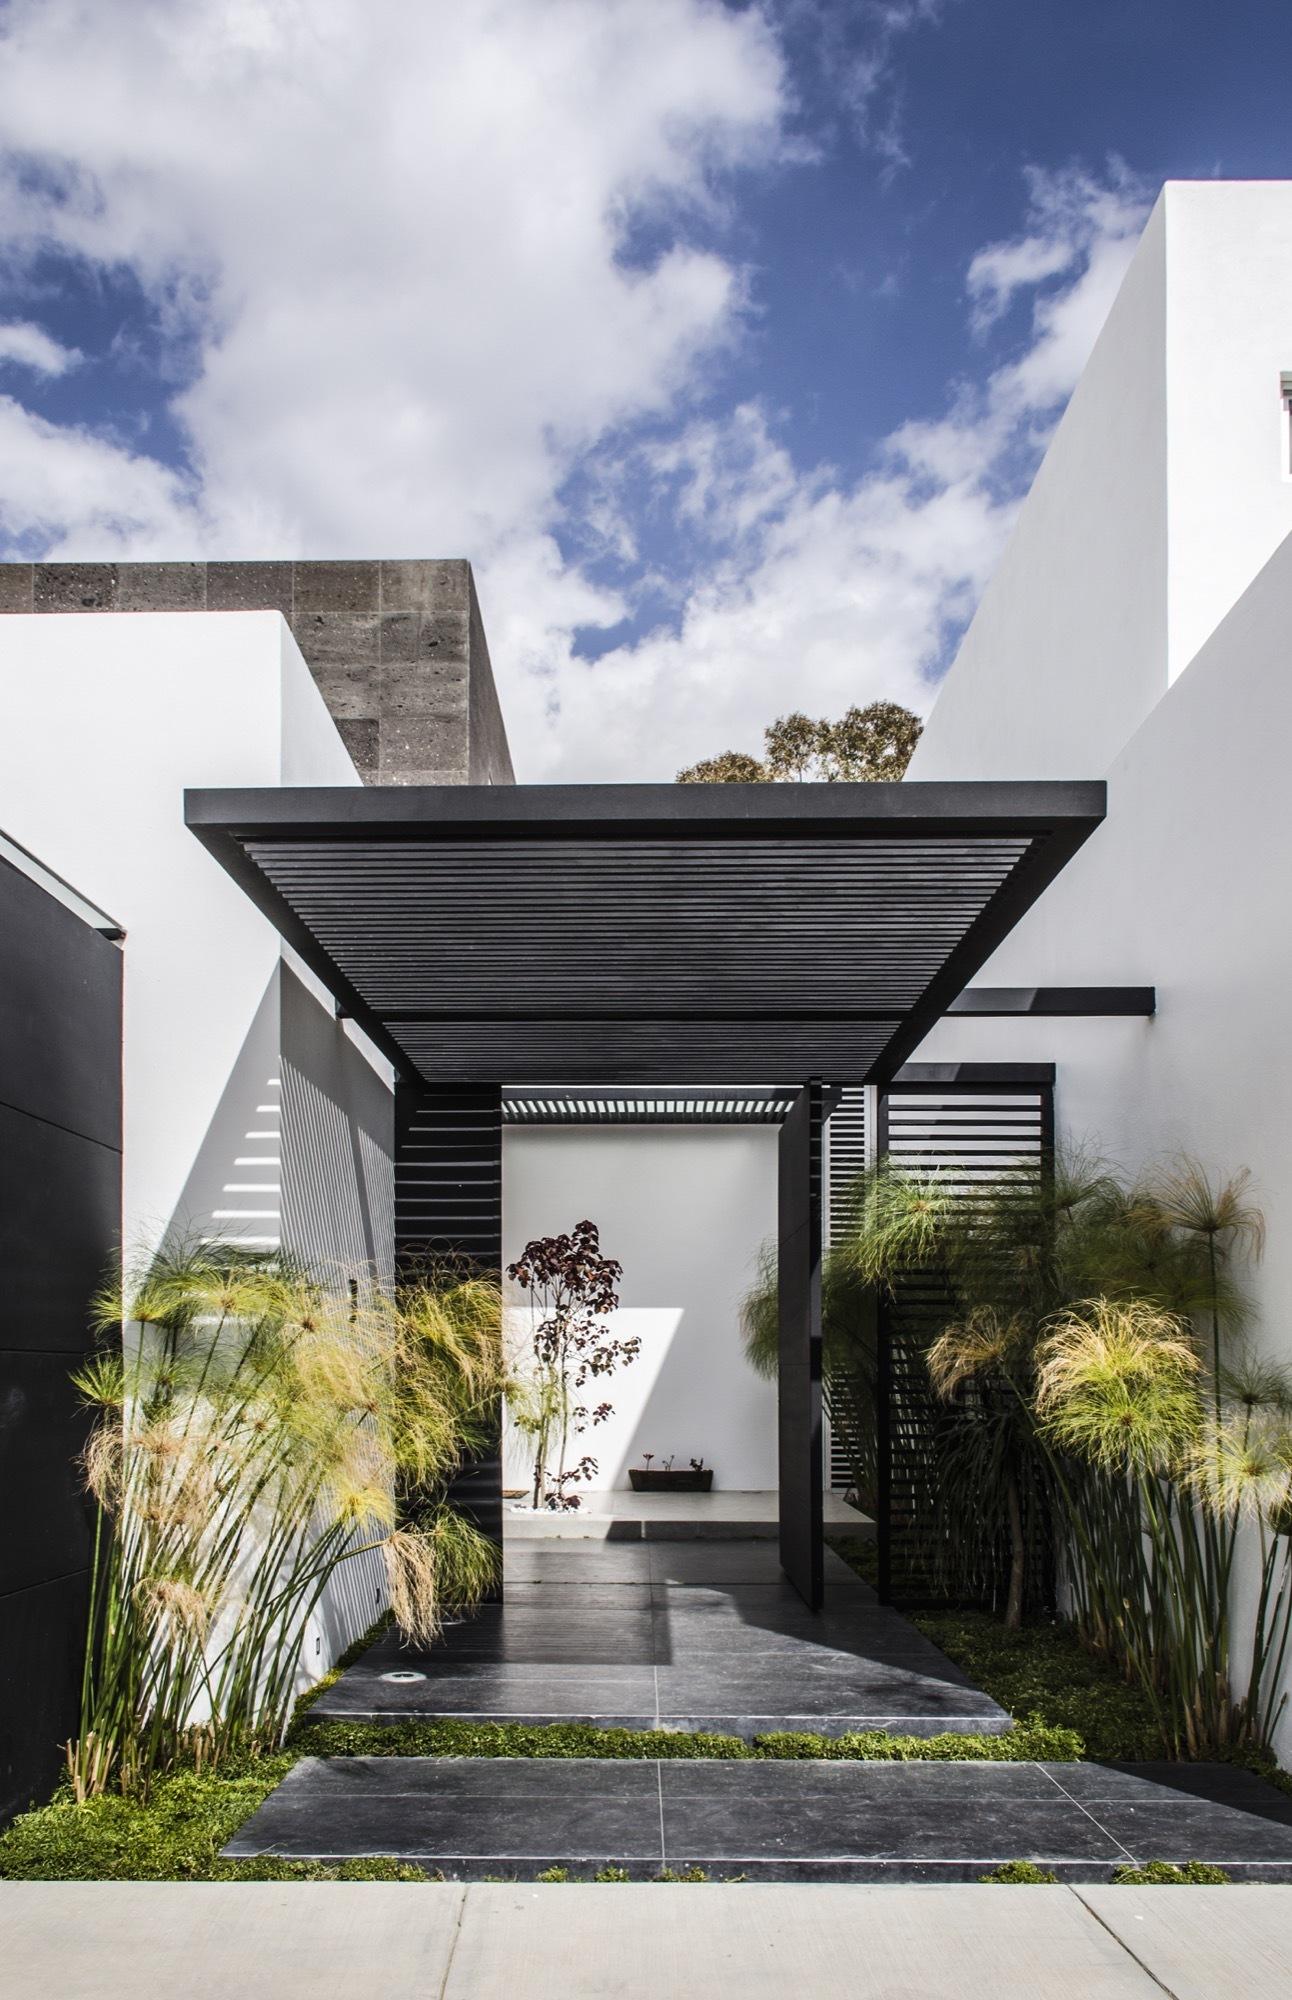 Casa mezquite bag arquitectura archdaily m xico for Casa vivienda jardin pdf